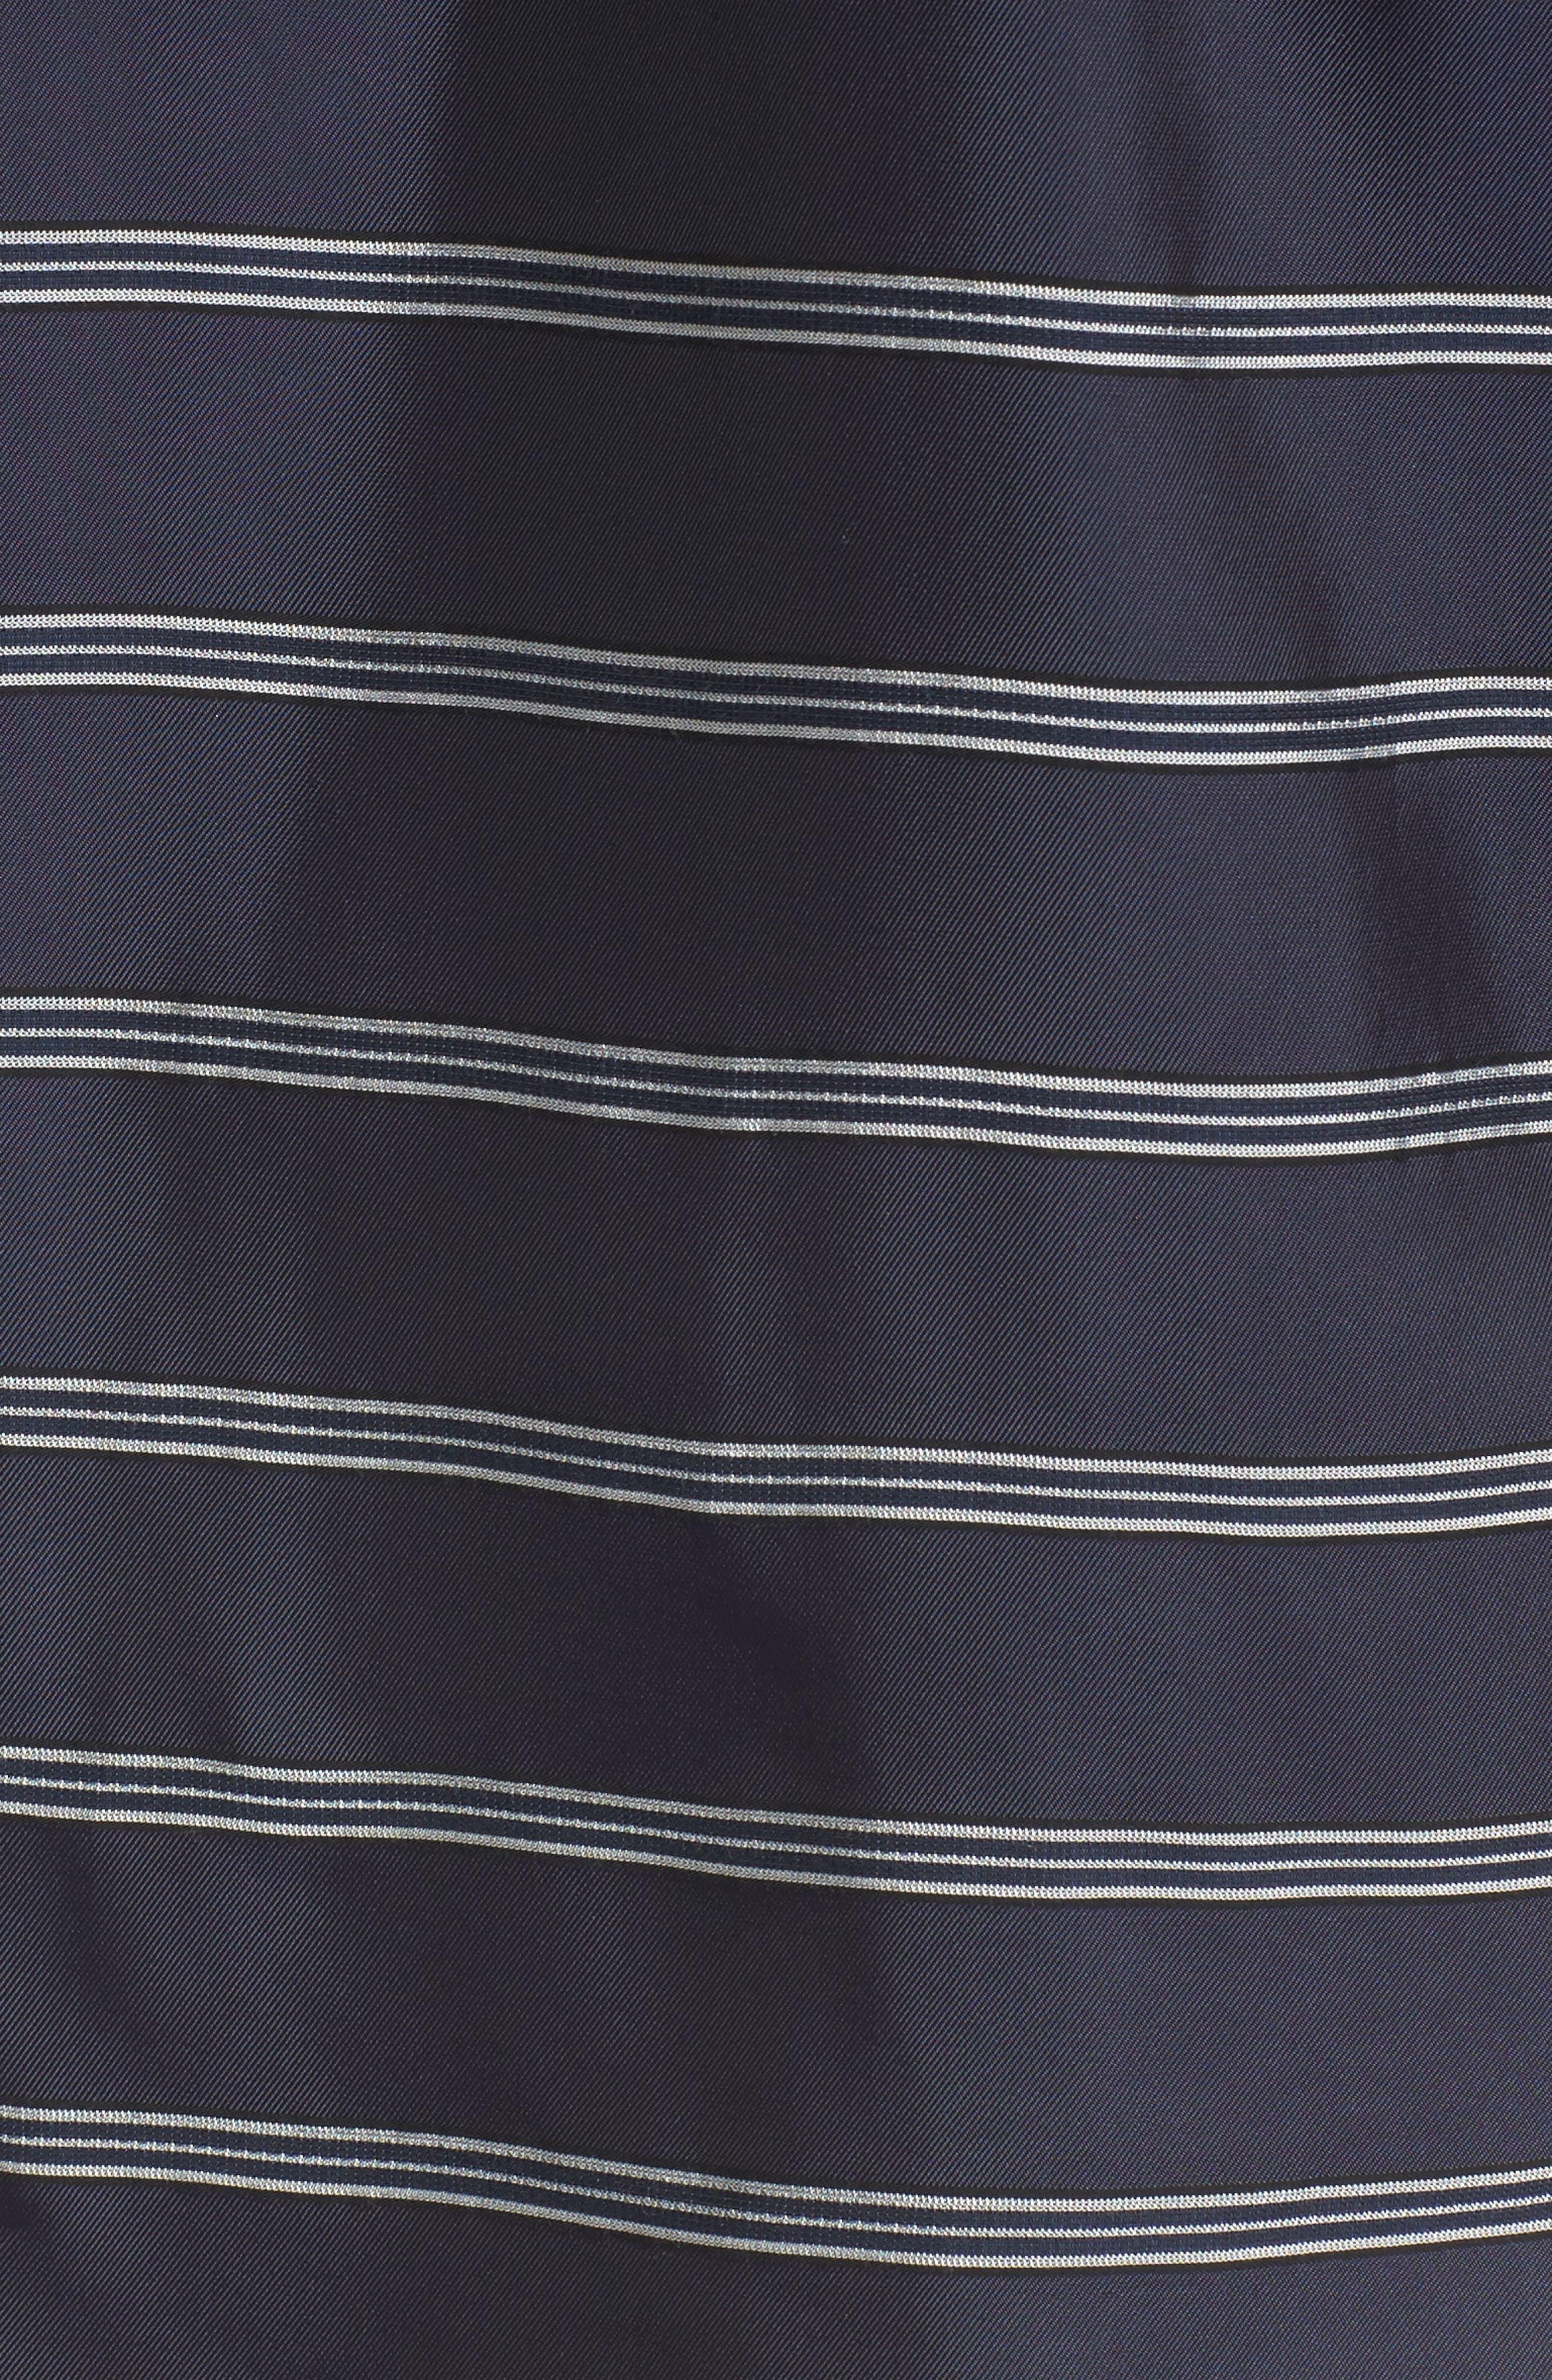 Striped Patch Pocket Shirt,                             Alternate thumbnail 5, color,                             410